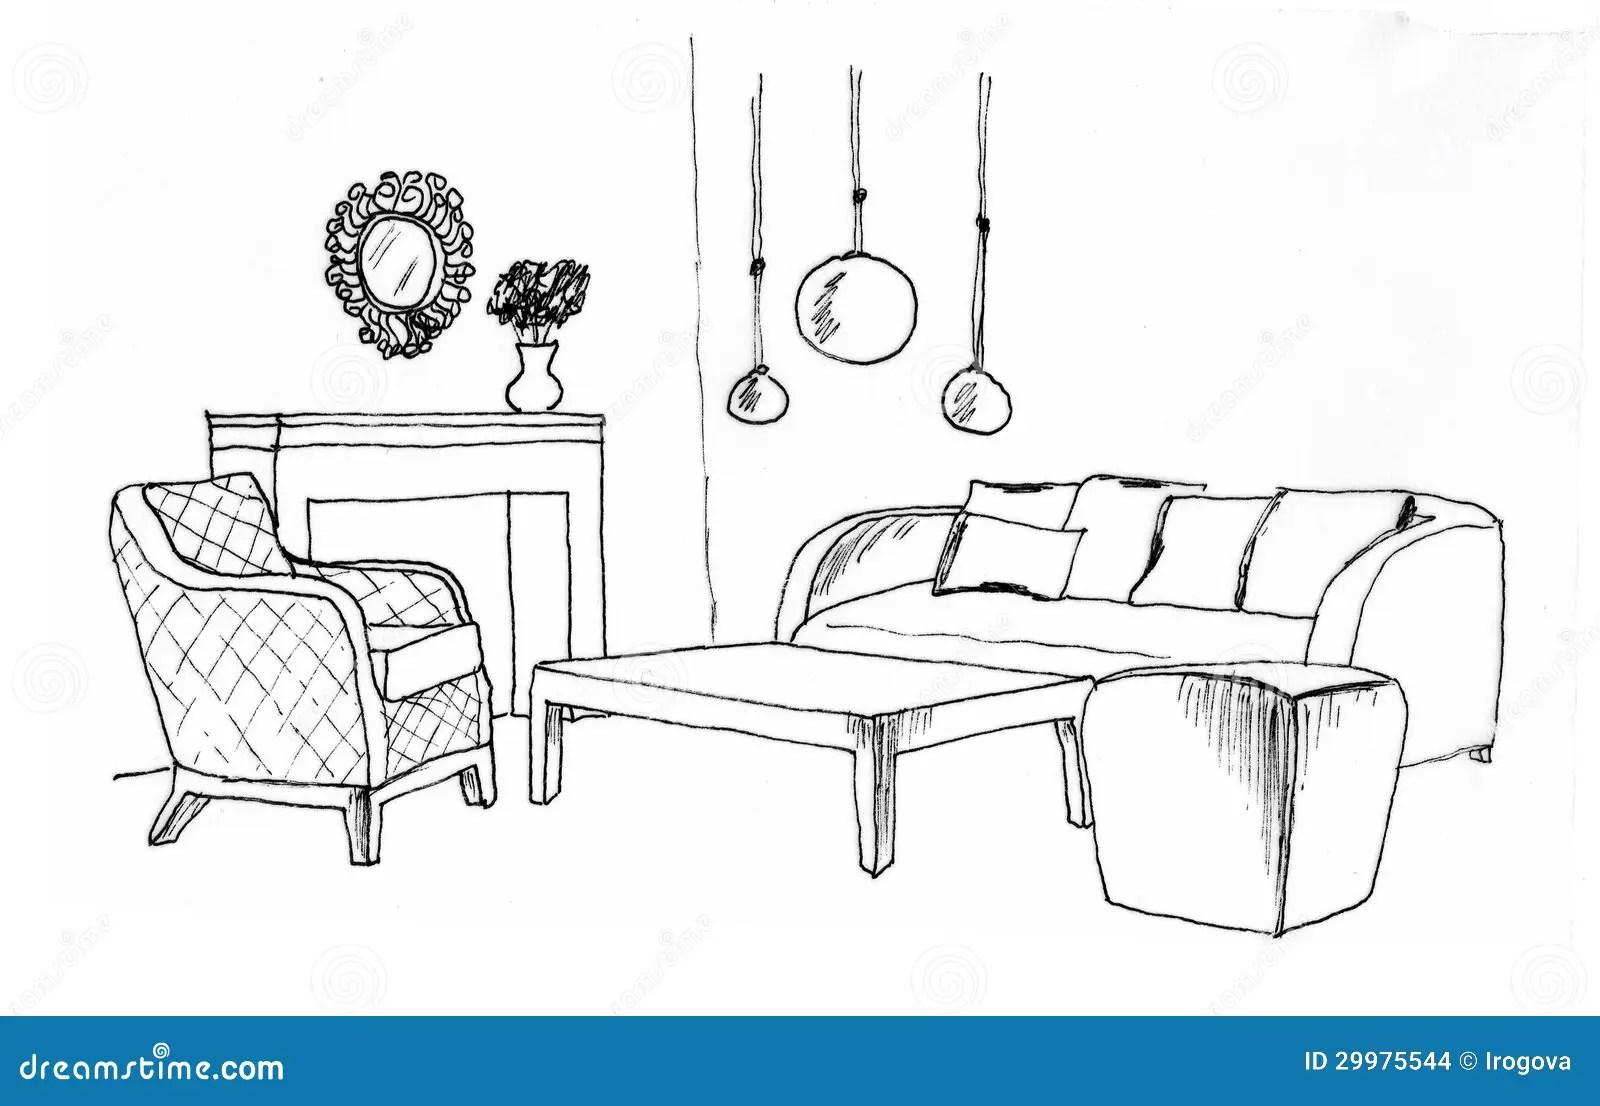 Esboco Grafico De Uma Sala De Visitas Interior Ilustracao Stock